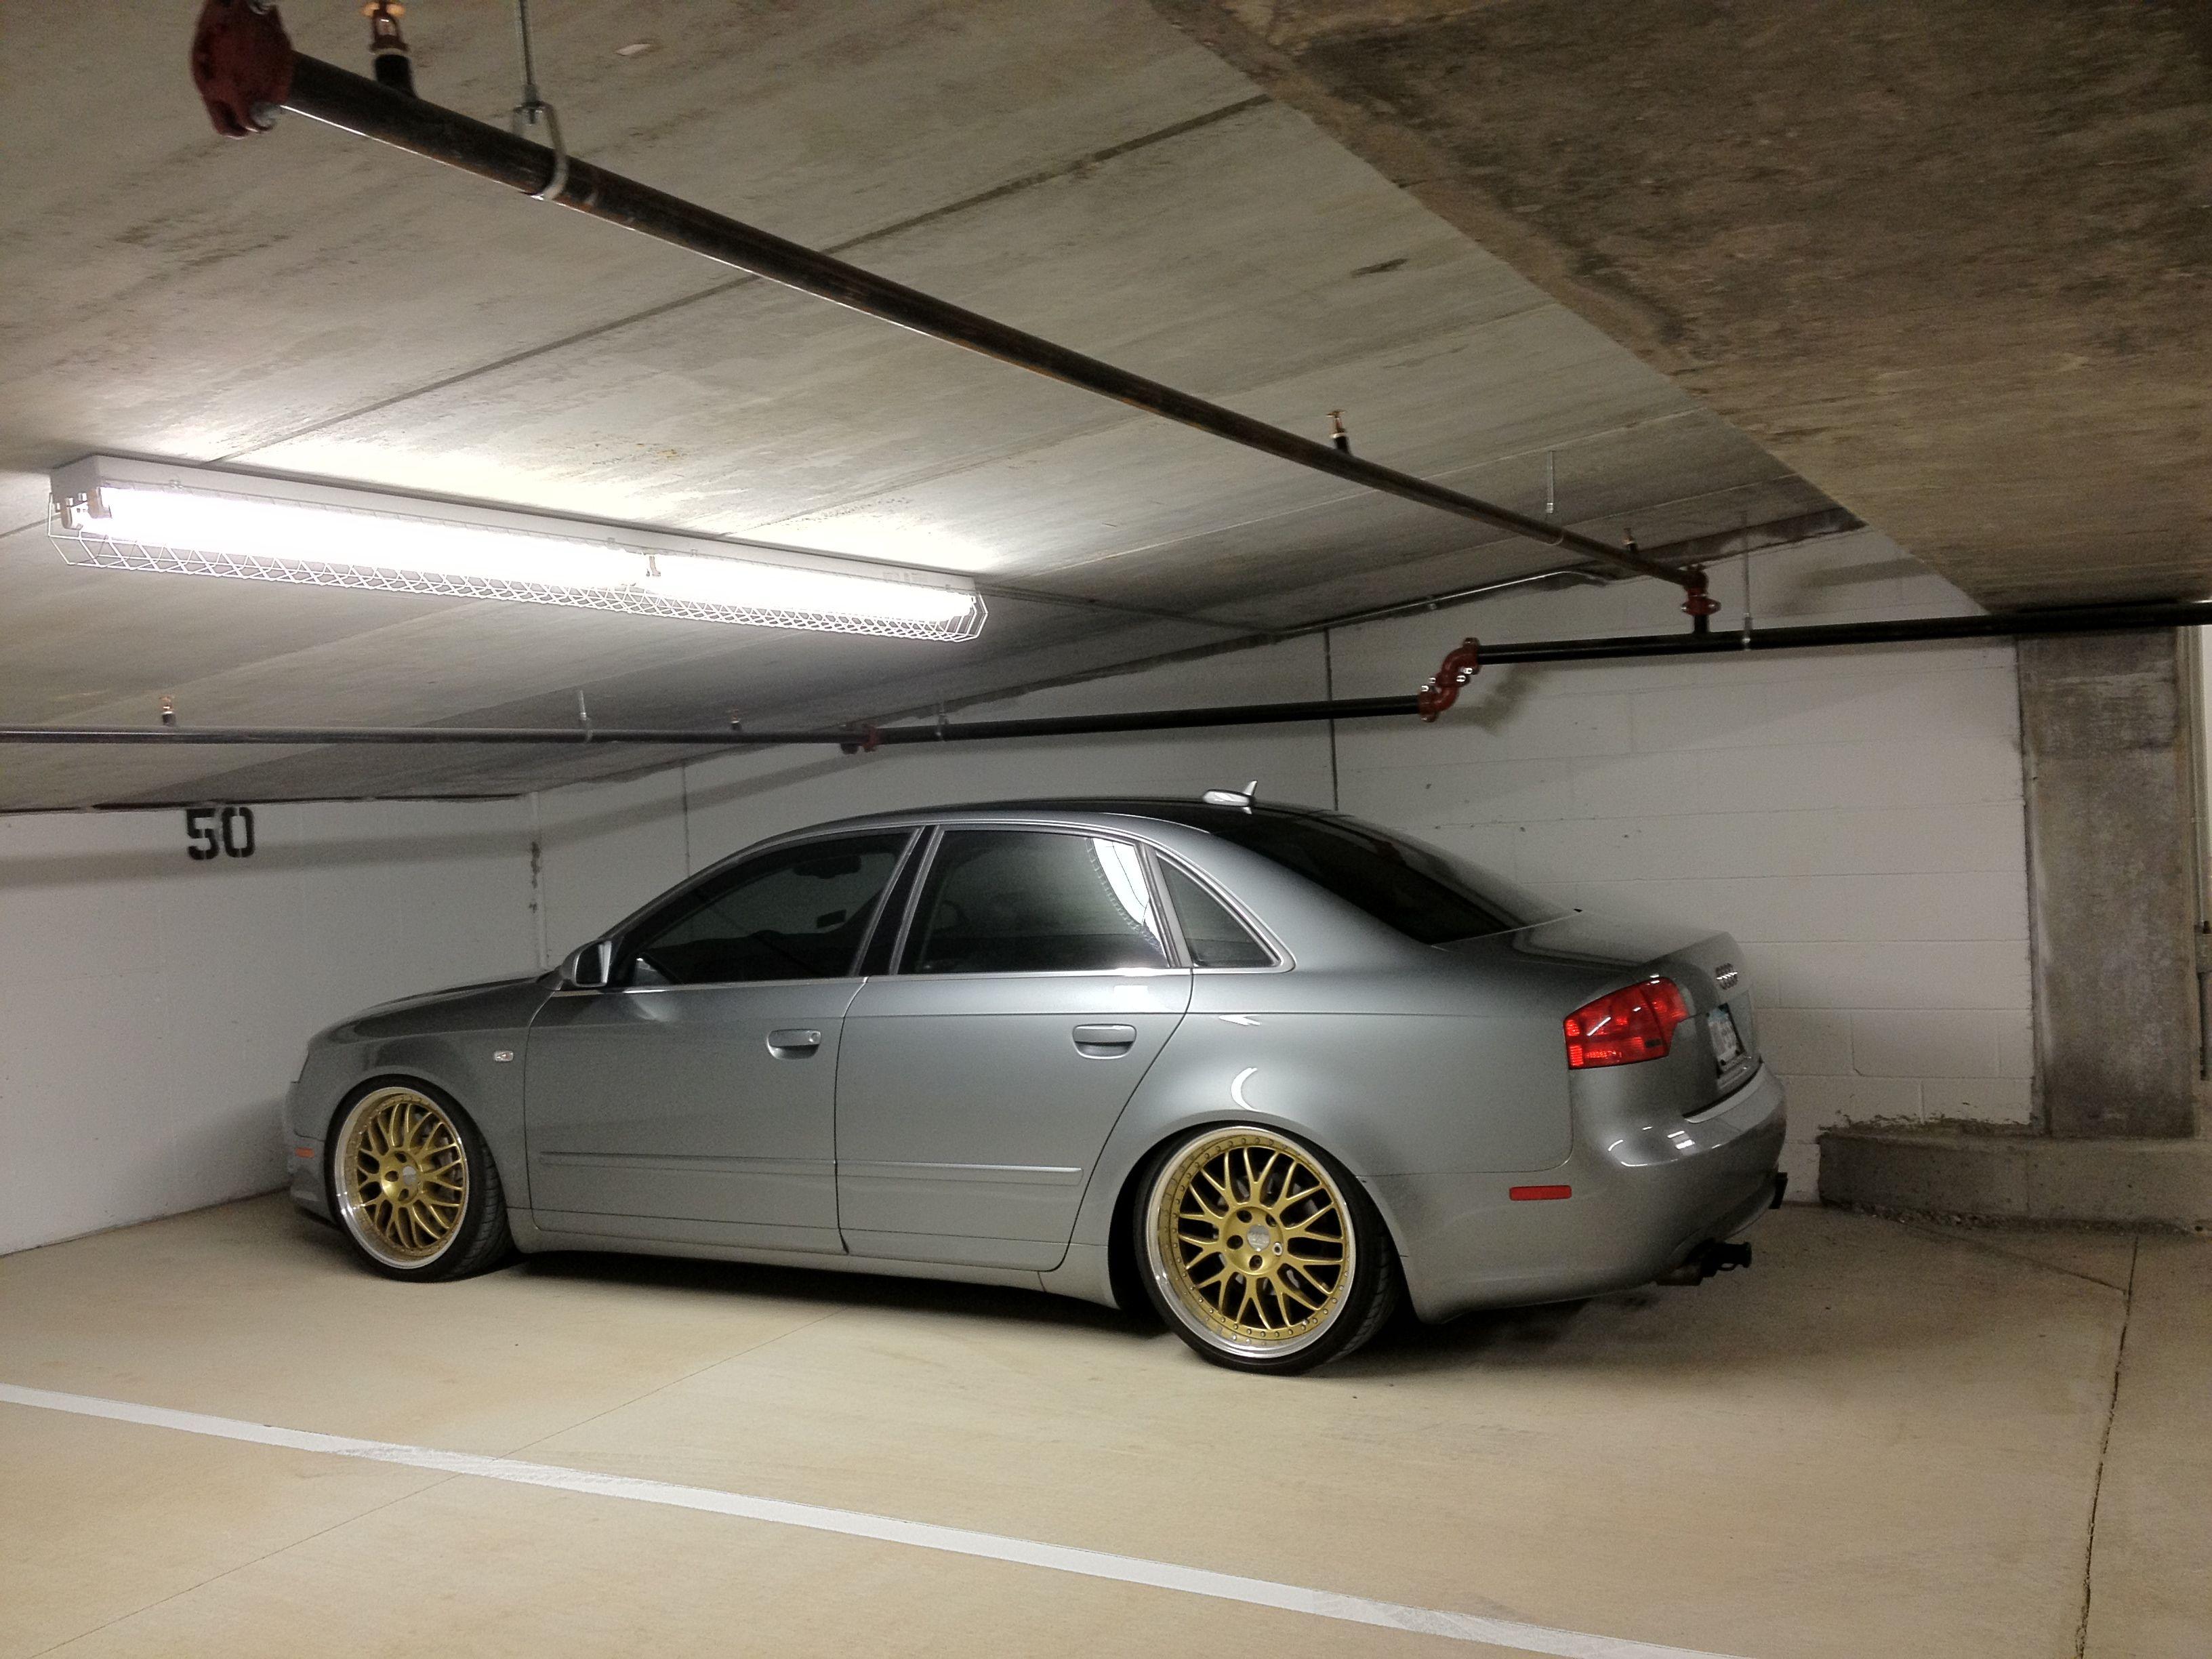 My B7 A4 Dumped Audi B7 Autoart Wheels Audi Audi Cars Audi